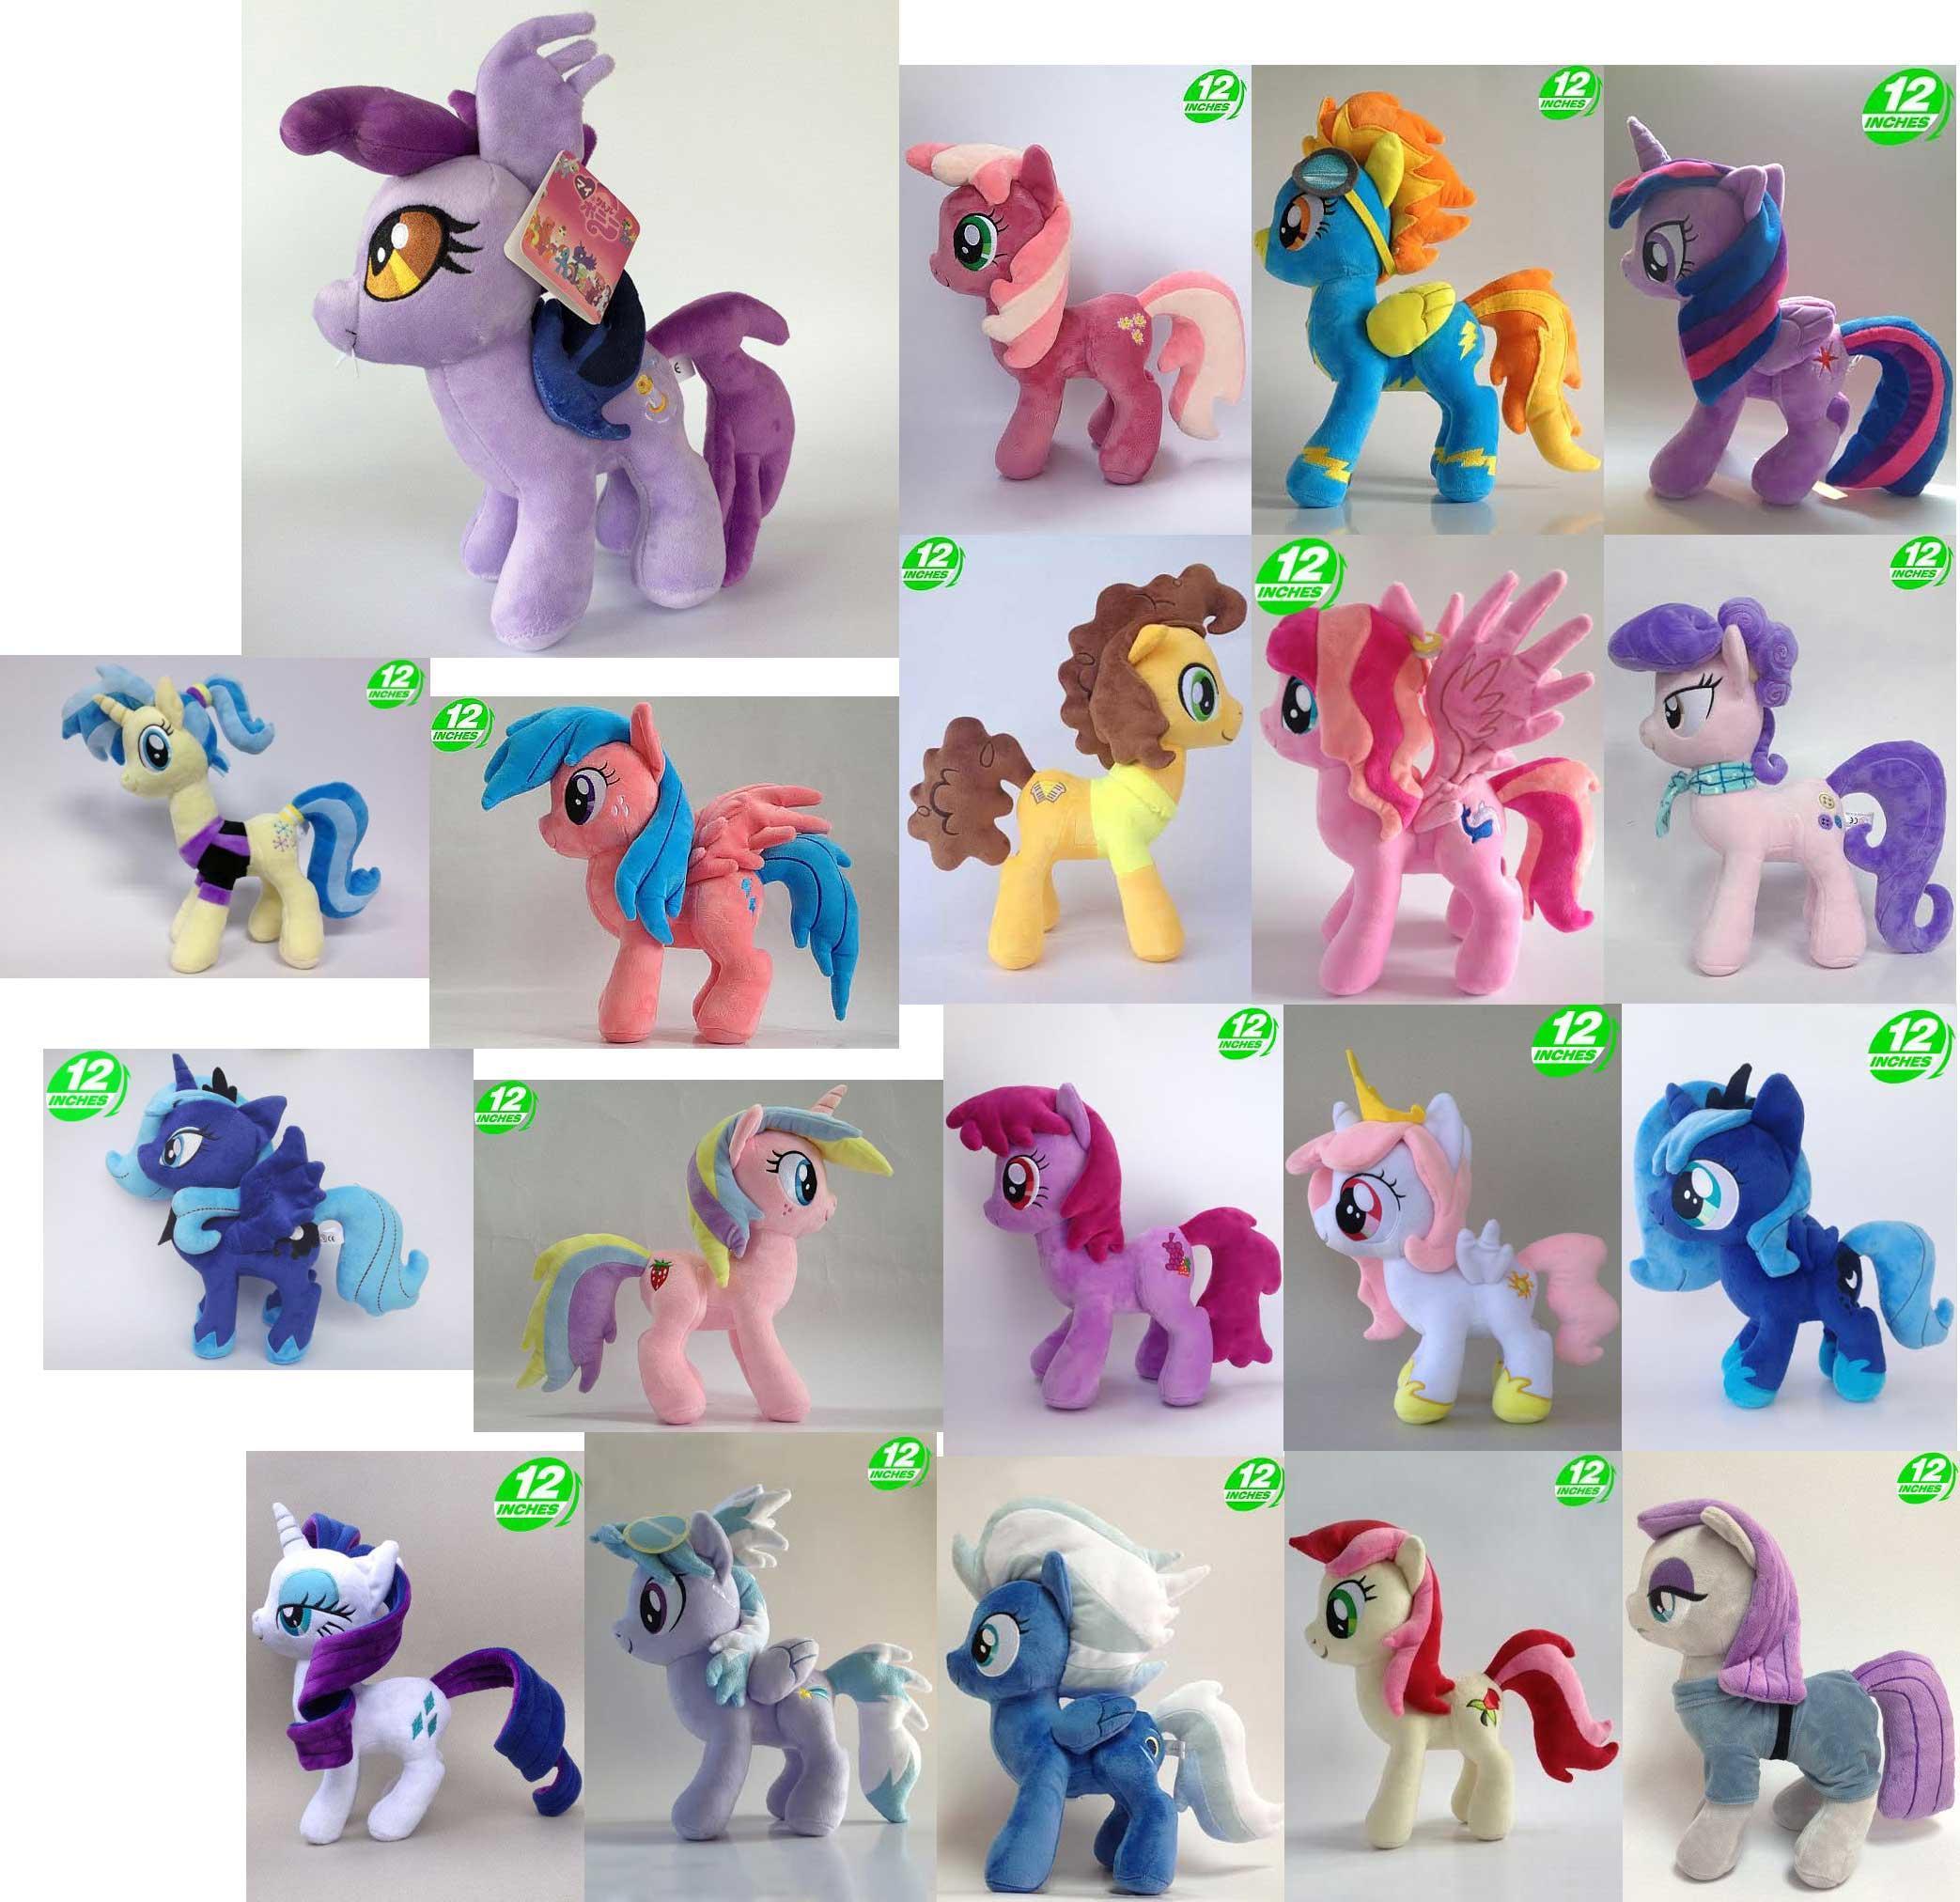 WTB My Little Pony OlyFactory plushies